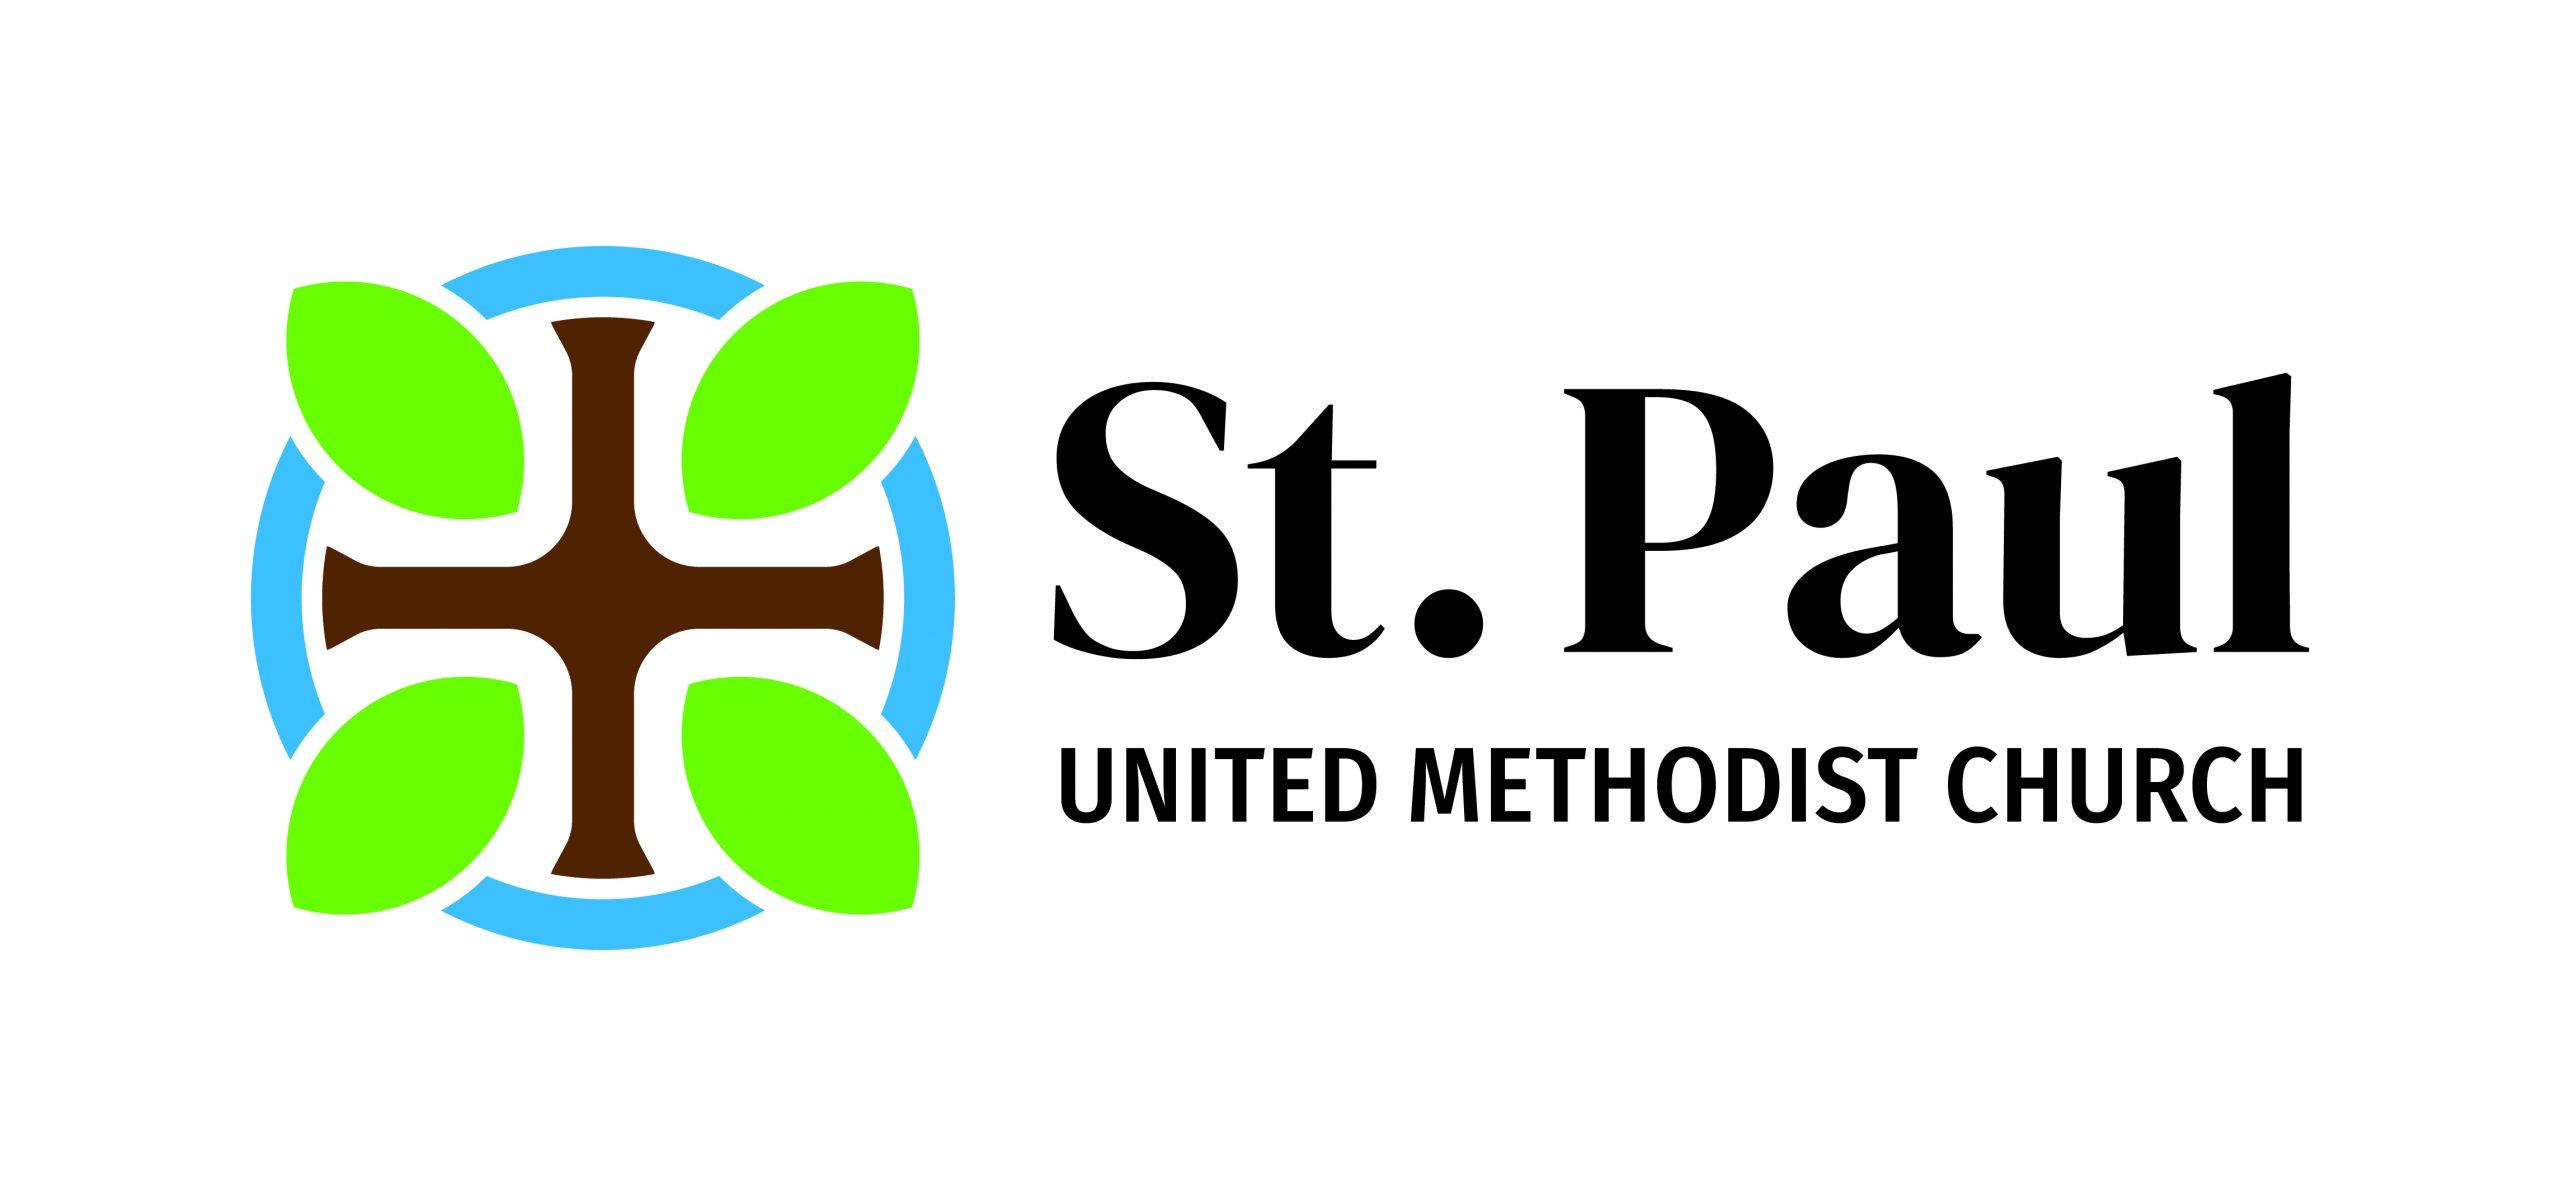 St. Paul UMC Church in Lakeland TN • Lakeland Church